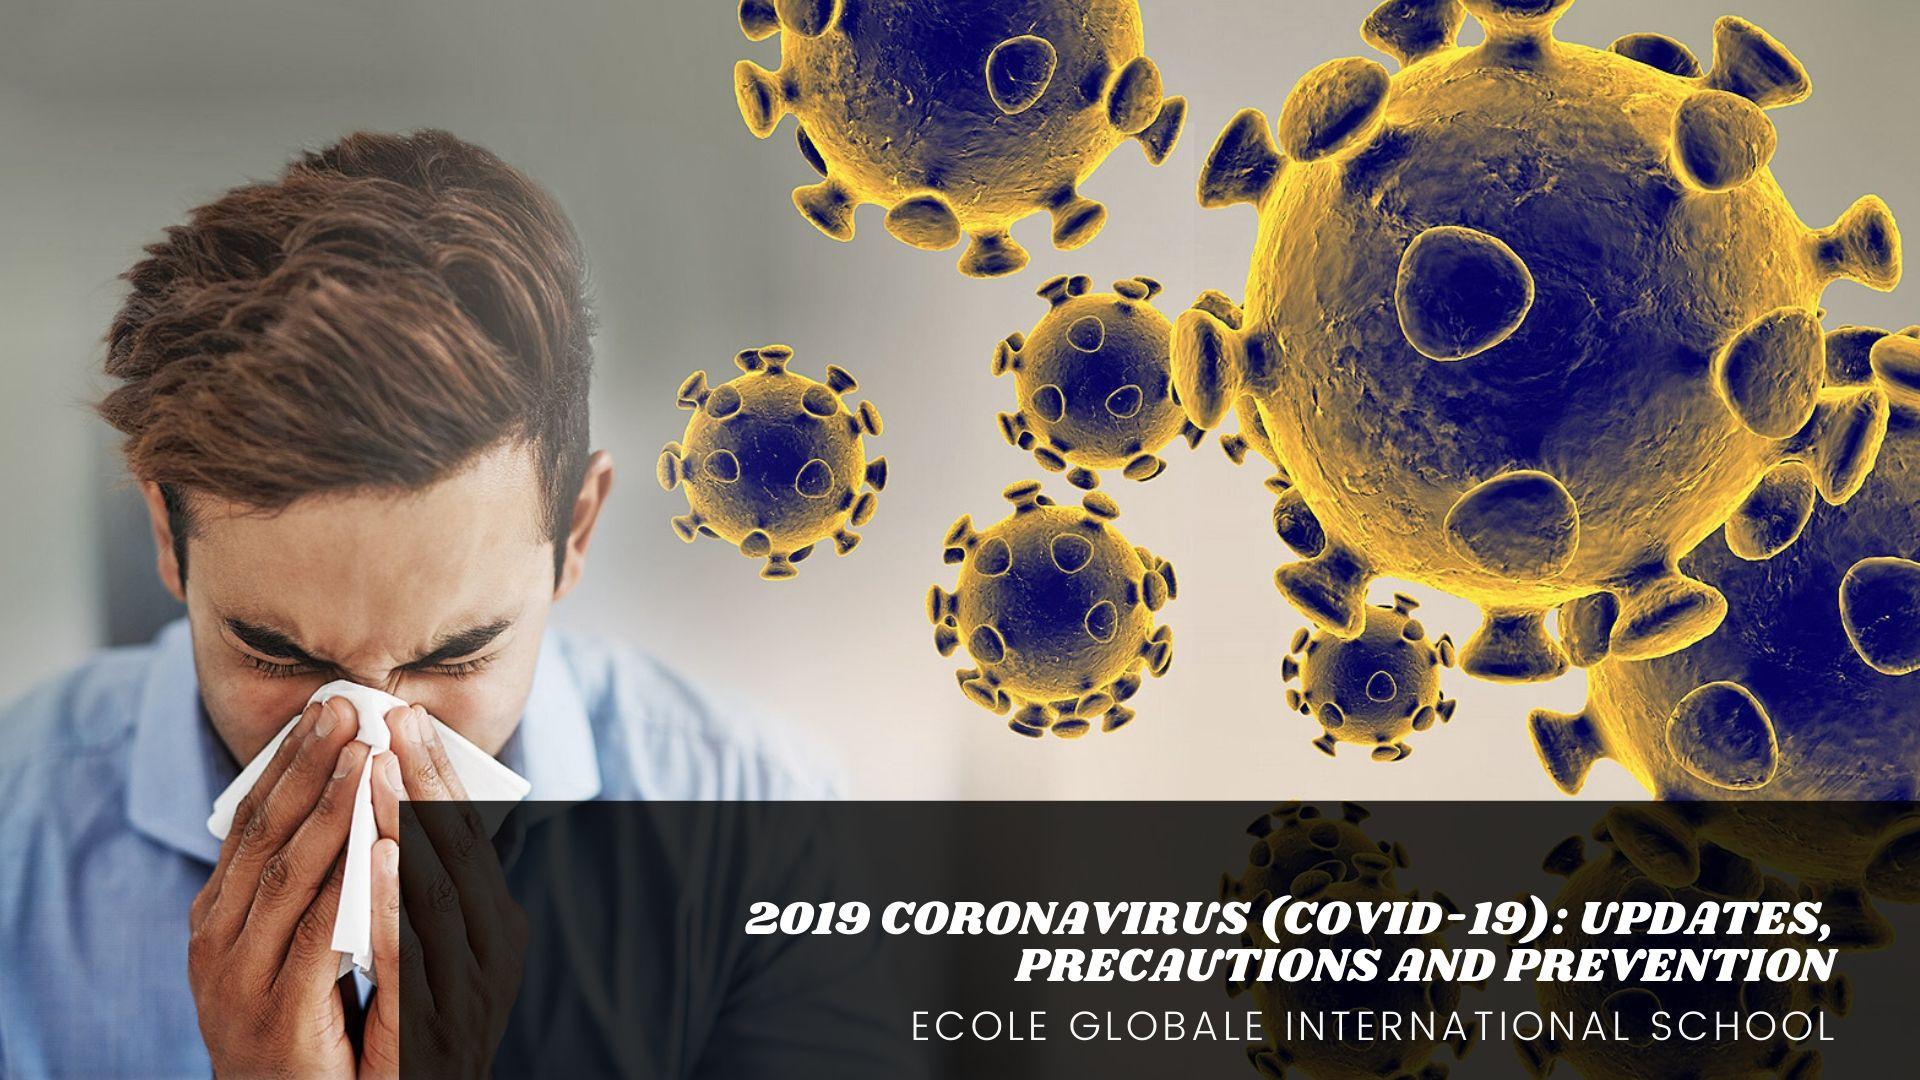 2019 CORONAVIRUS (COVID-19): UPDATES, PRECAUTIONS AND PREVENTION